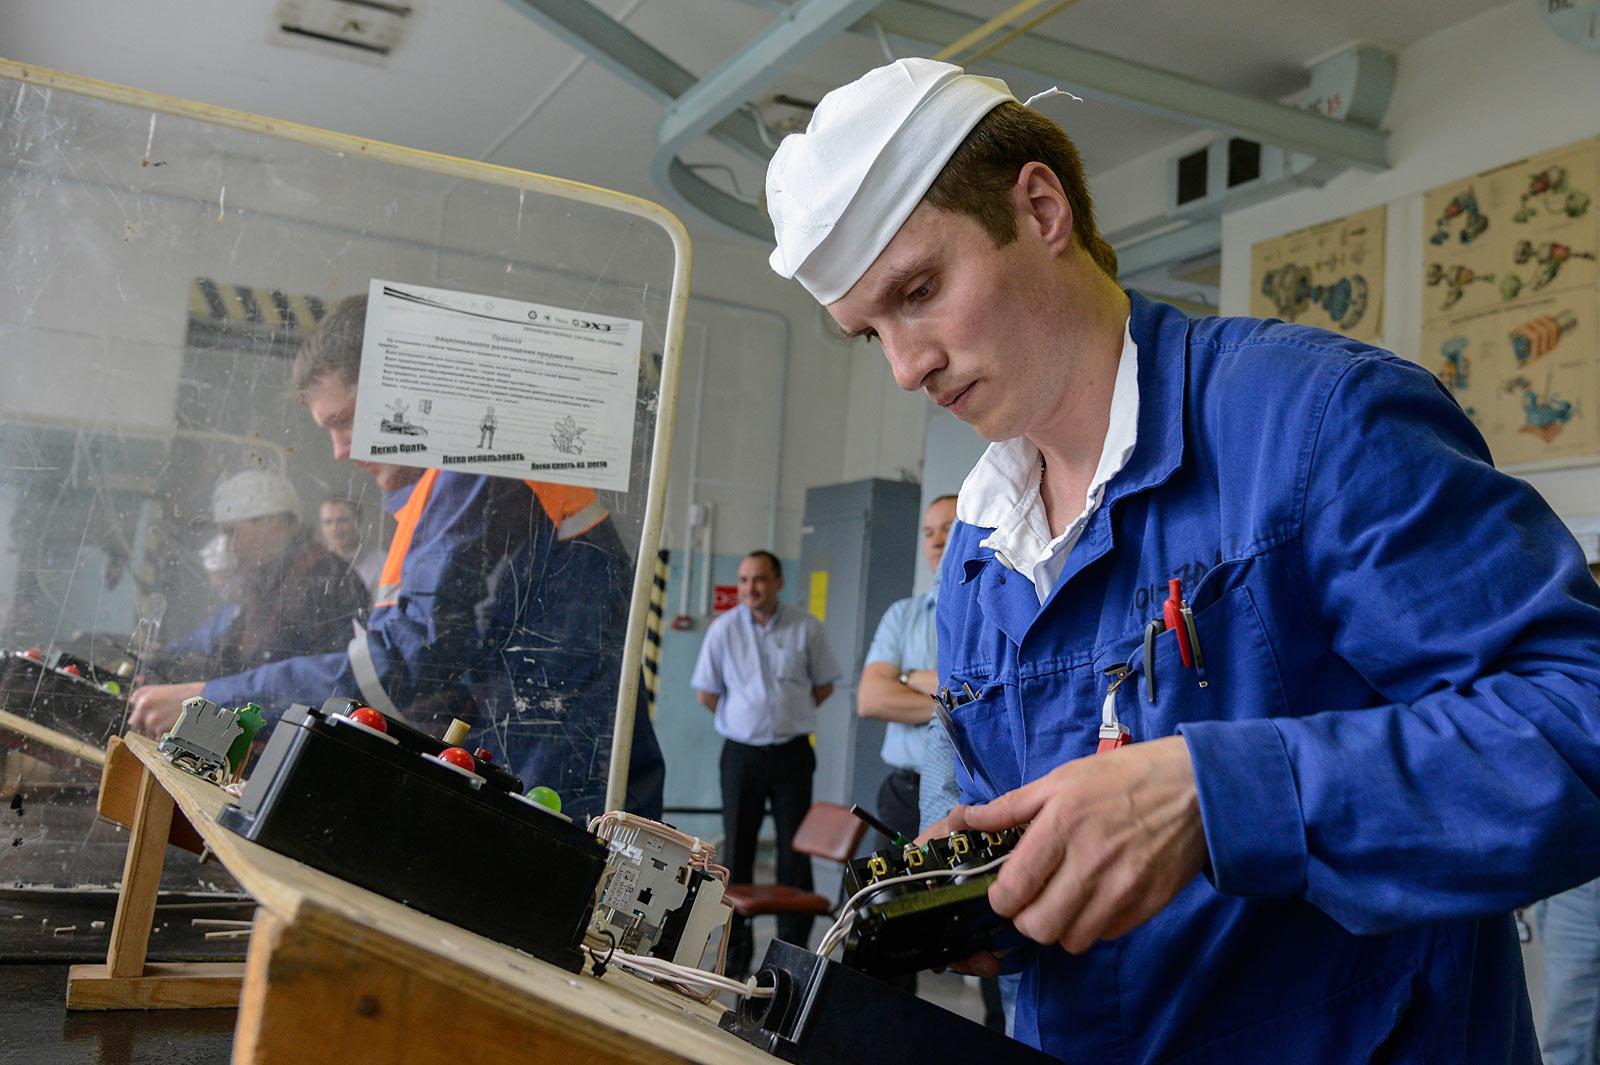 Конкурс профмастерства электромонтеров